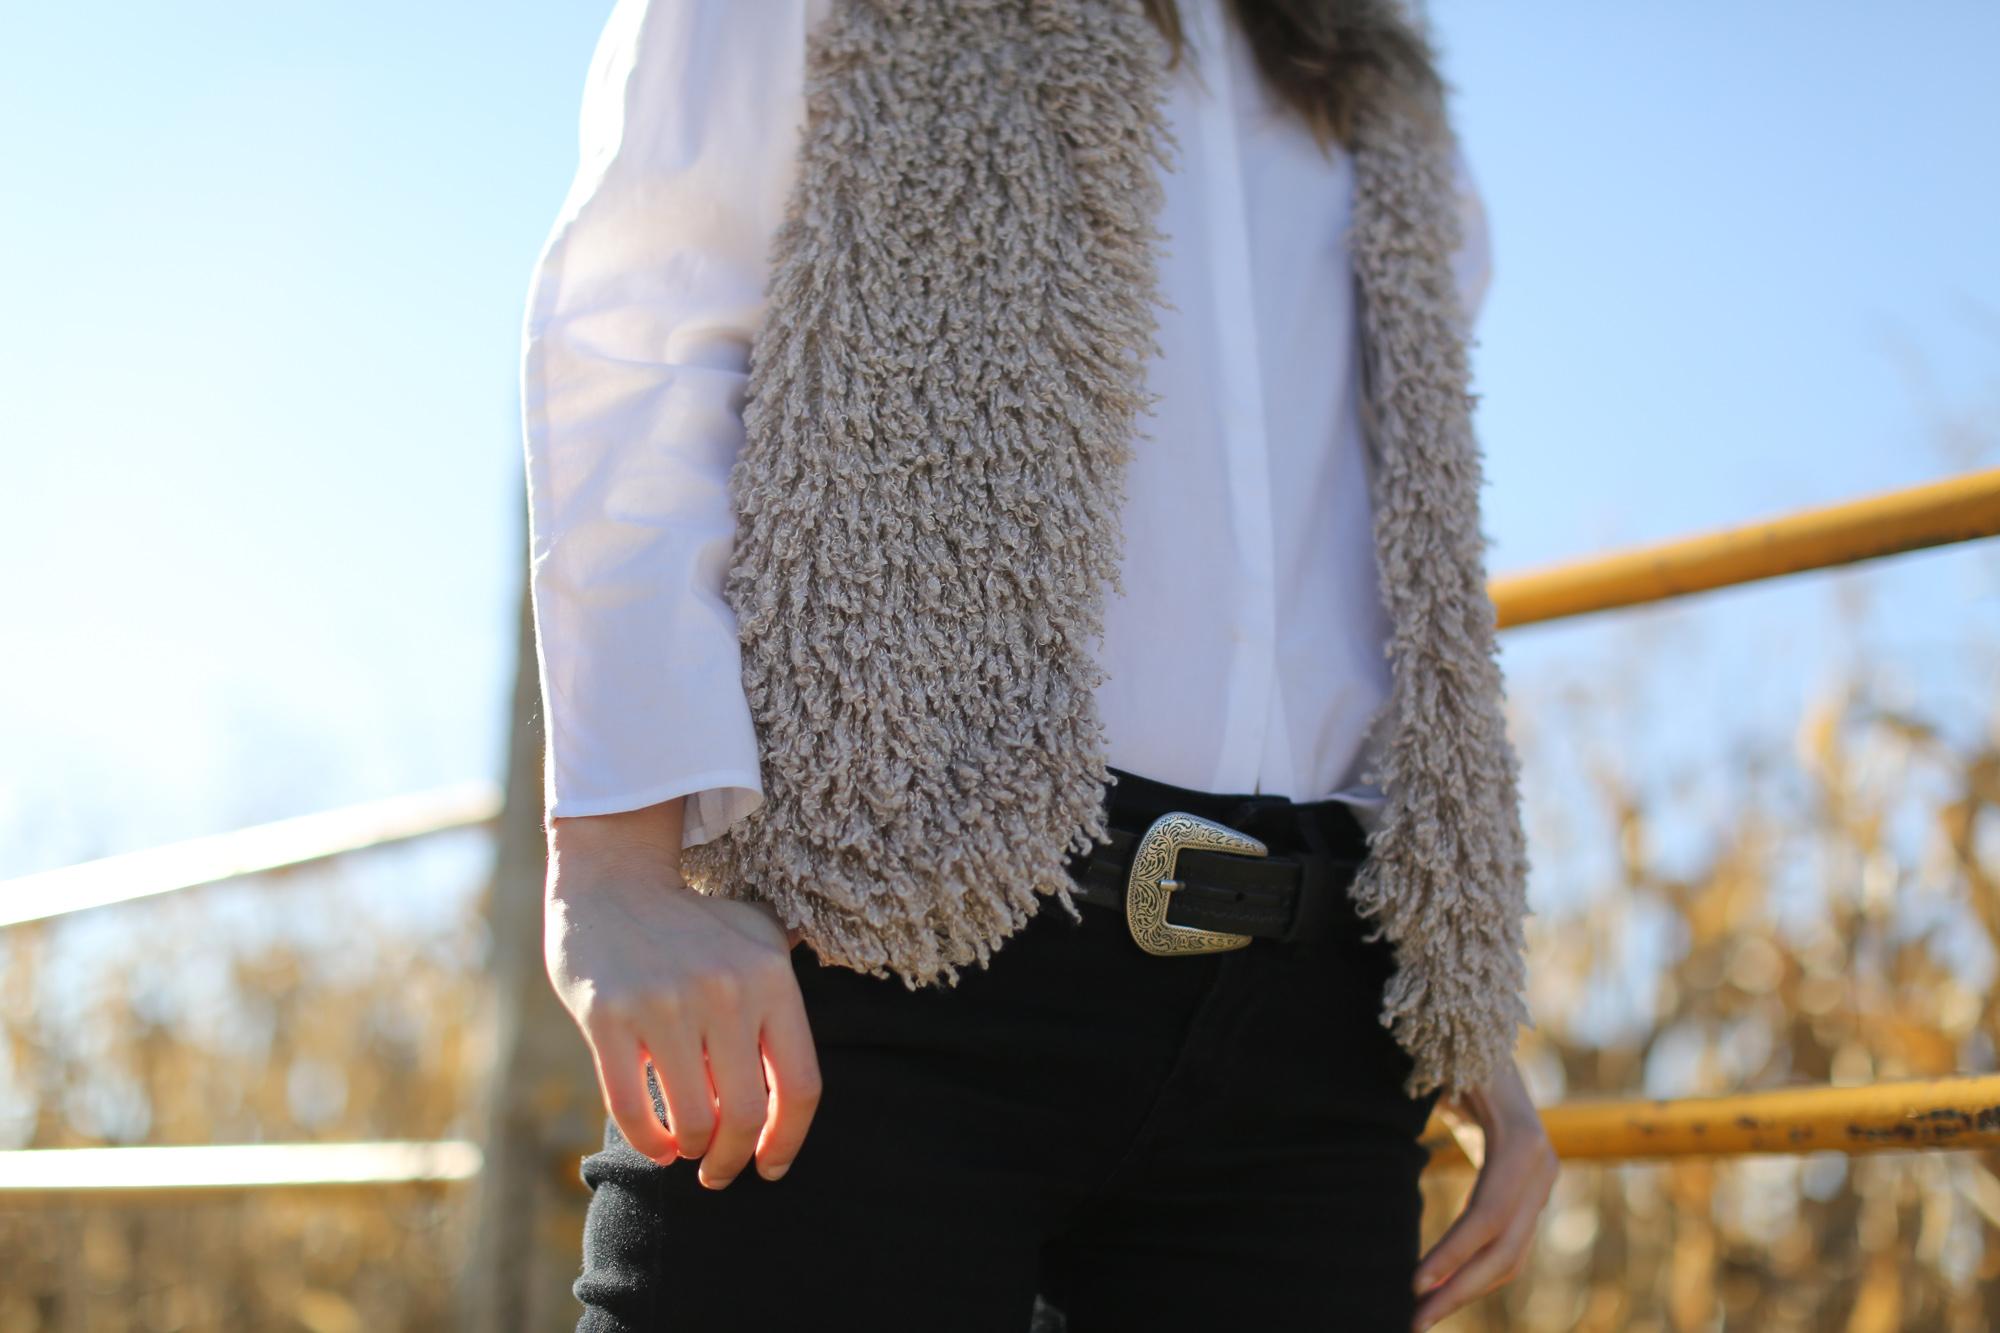 Clochet_streetstyle_cowboy_boots_fedora_hat_waistcoat-1-9